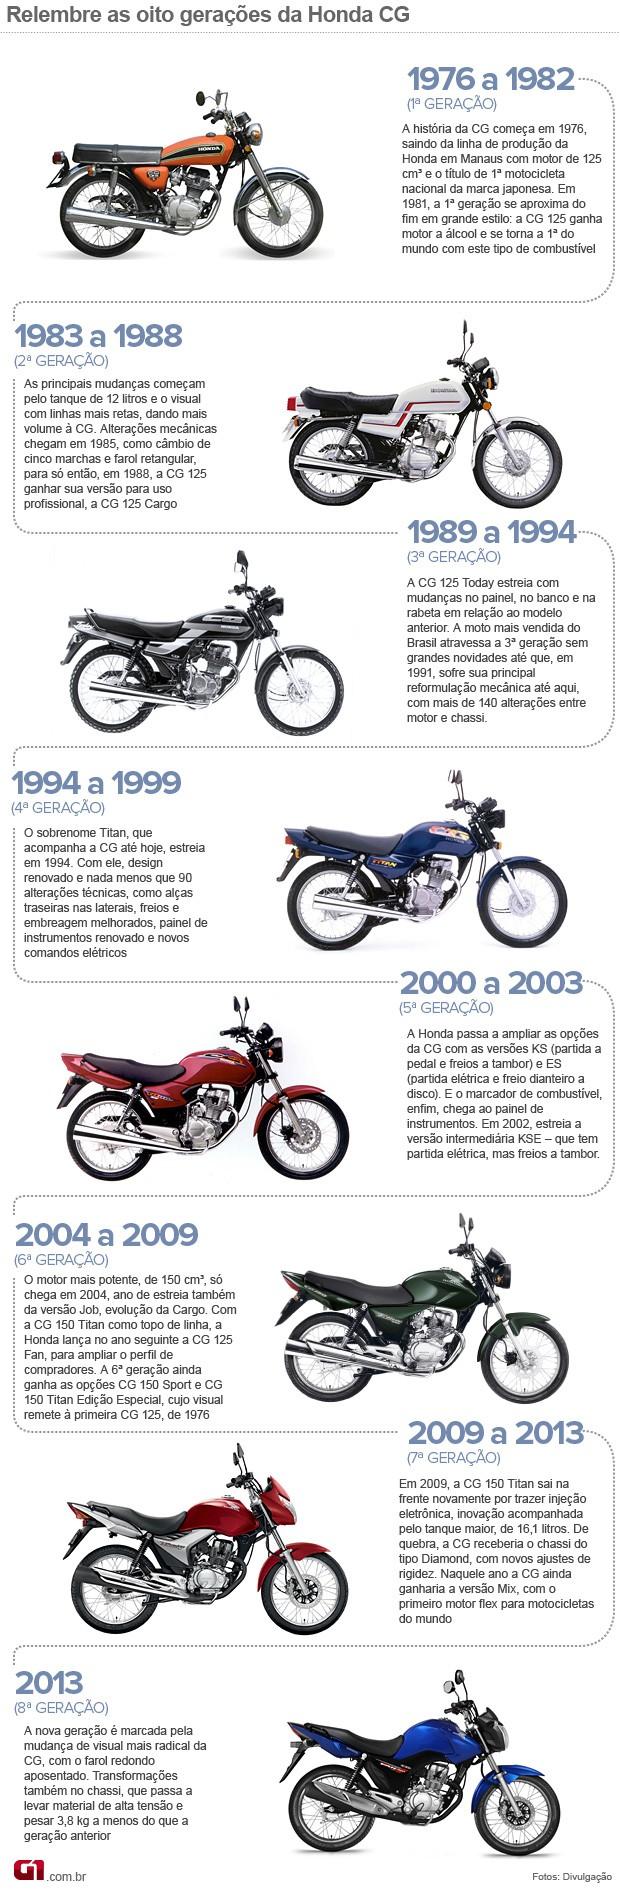 Nova Cg 160 Titan Ex likewise YAMAHA YBR 250 1174 furthermore JwVeqXLYChc furthermore Aprilia Classic 125 additionally Honda Cg Titan 125 2005. on moto honda cg 125